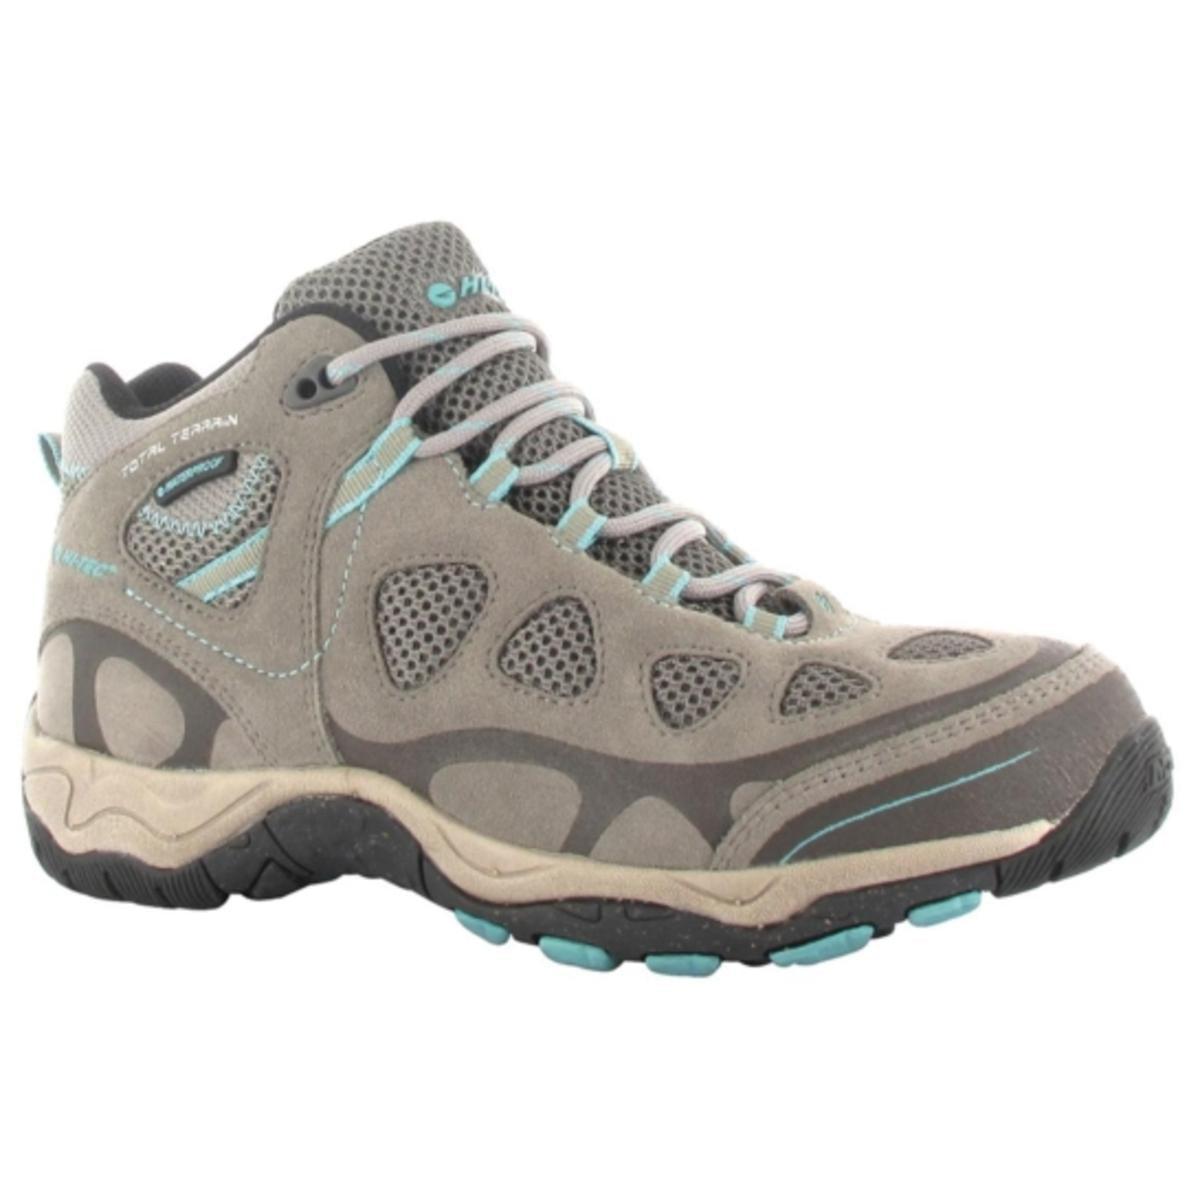 Hi-Tec 40691Total Terrain Mid WP Womens Waterproof Shoe, Hot Grey Aquamatic by Hi-Tec